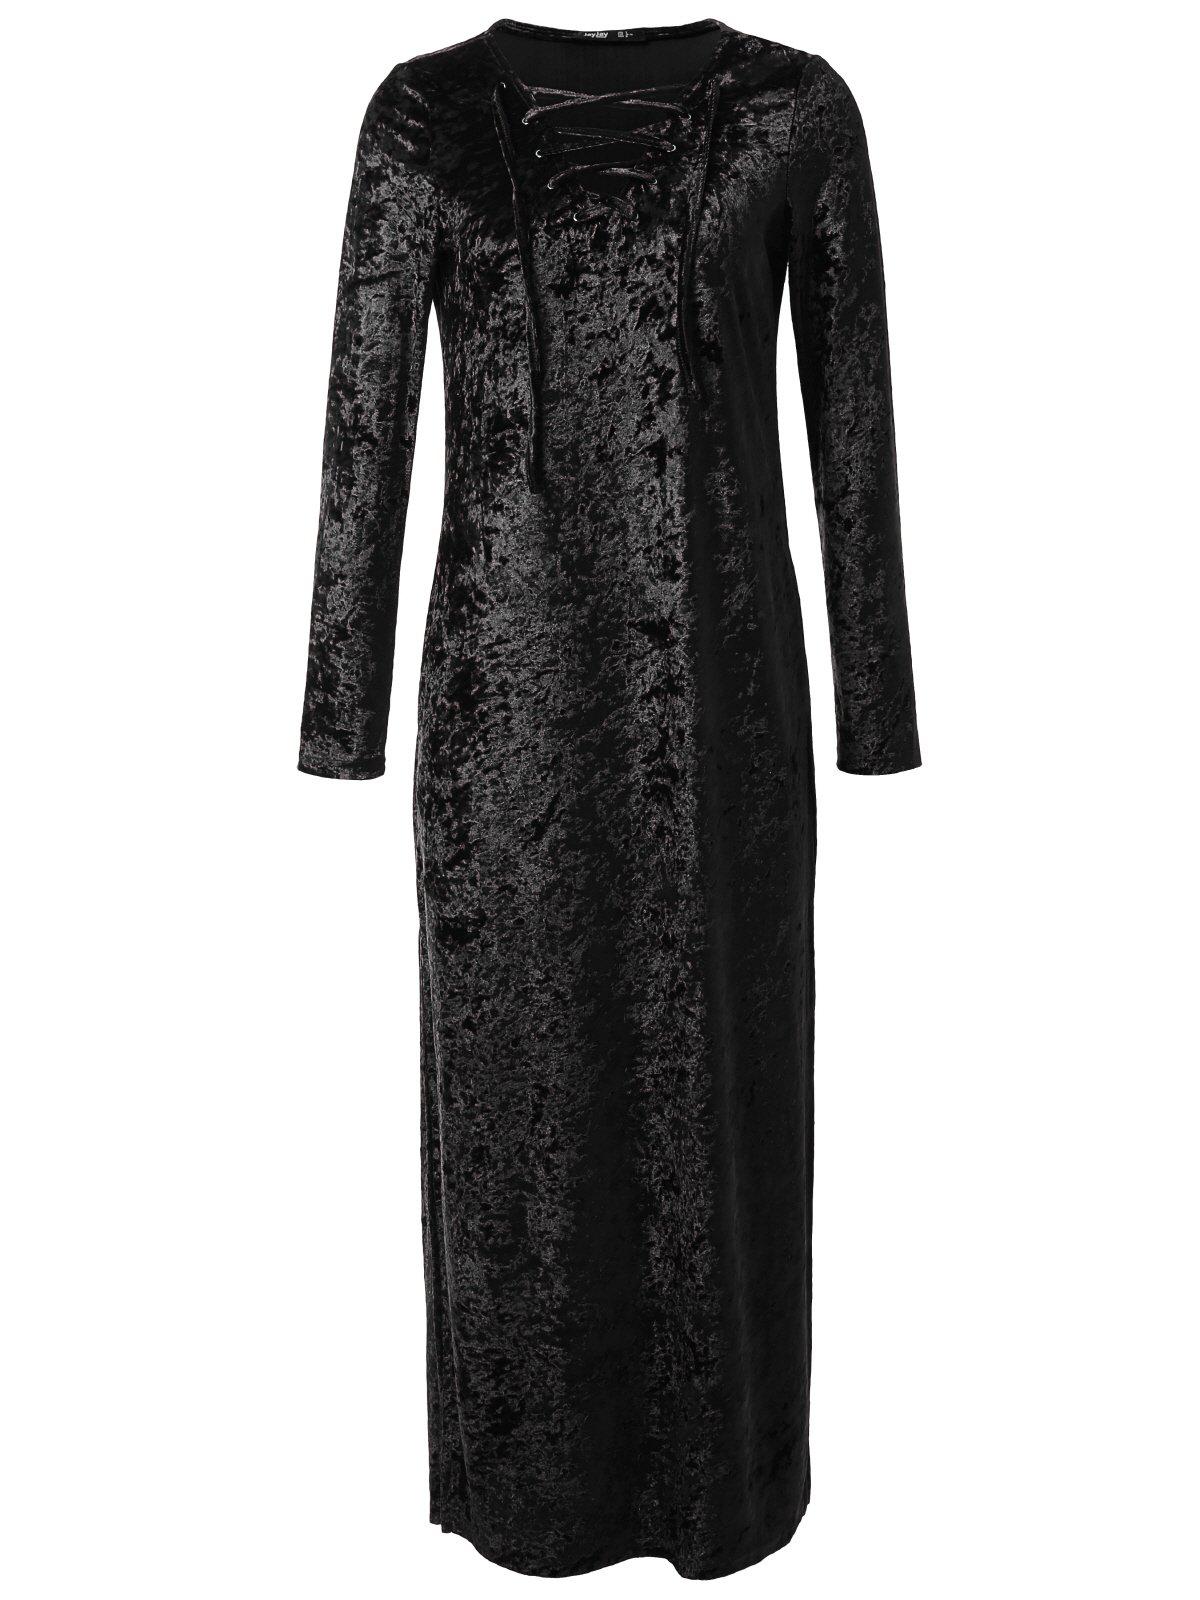 JayJay Women Elegant Vintage Caged Neck Velvet Long Maxi Dress With Pocket,Black,2XL